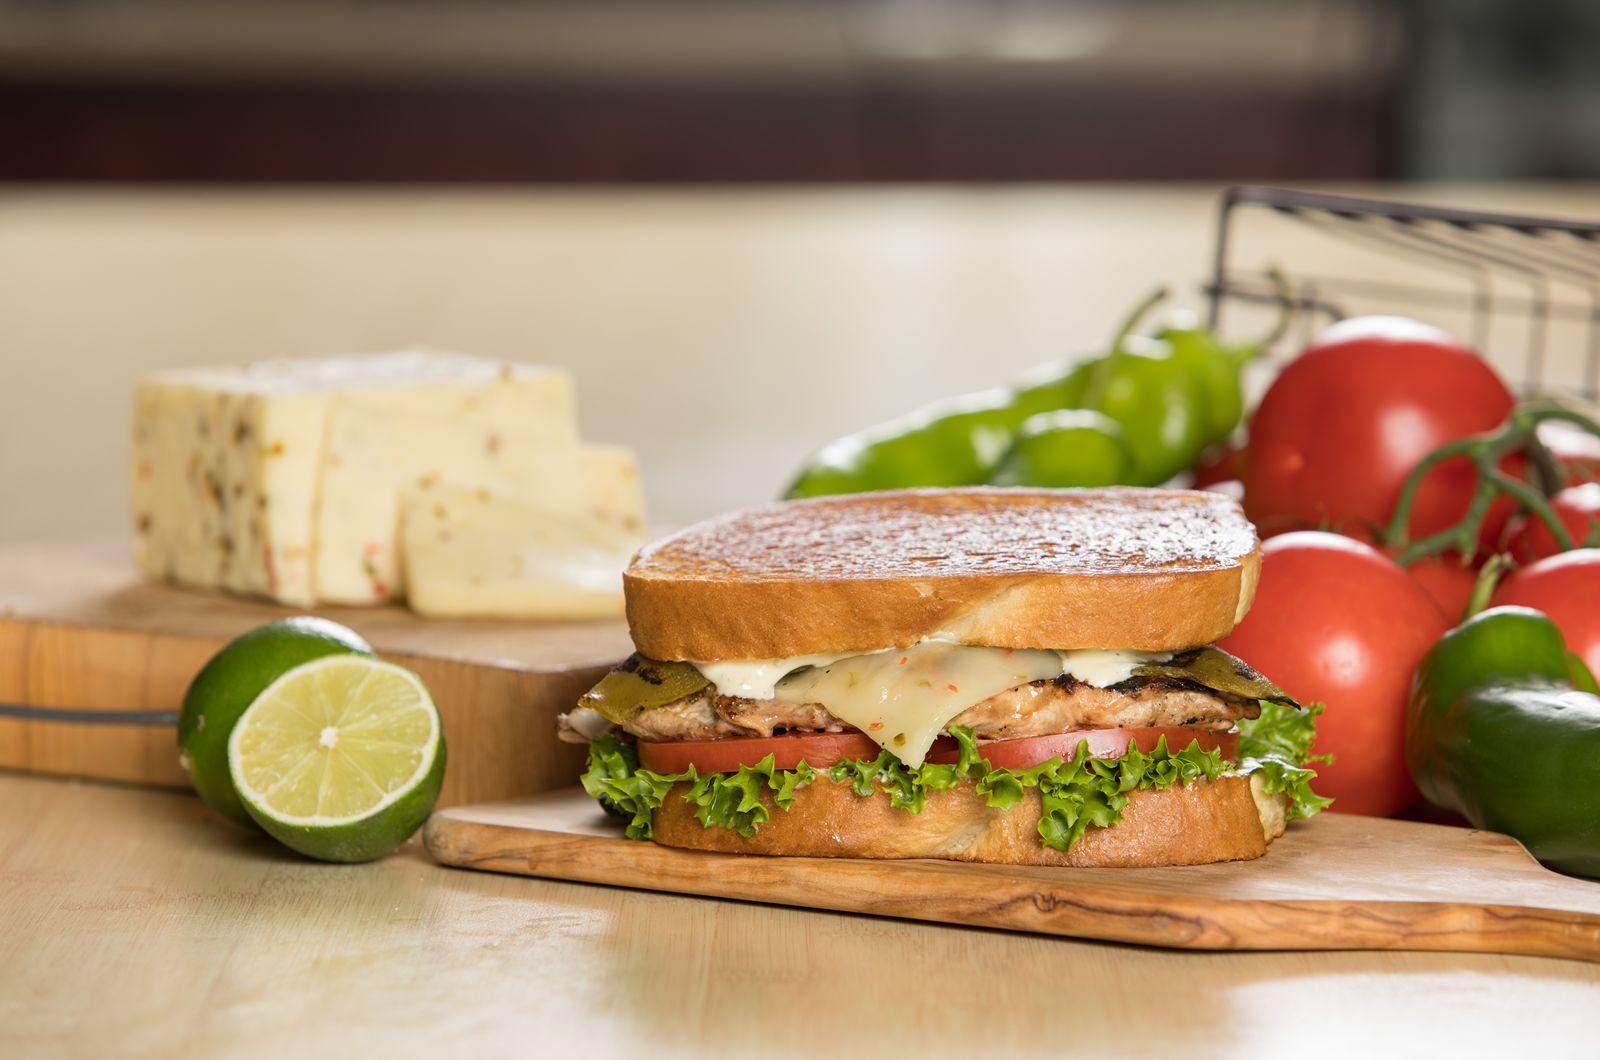 The Habit Burger Grill Features Seasonal Hatch Chile Menu Items